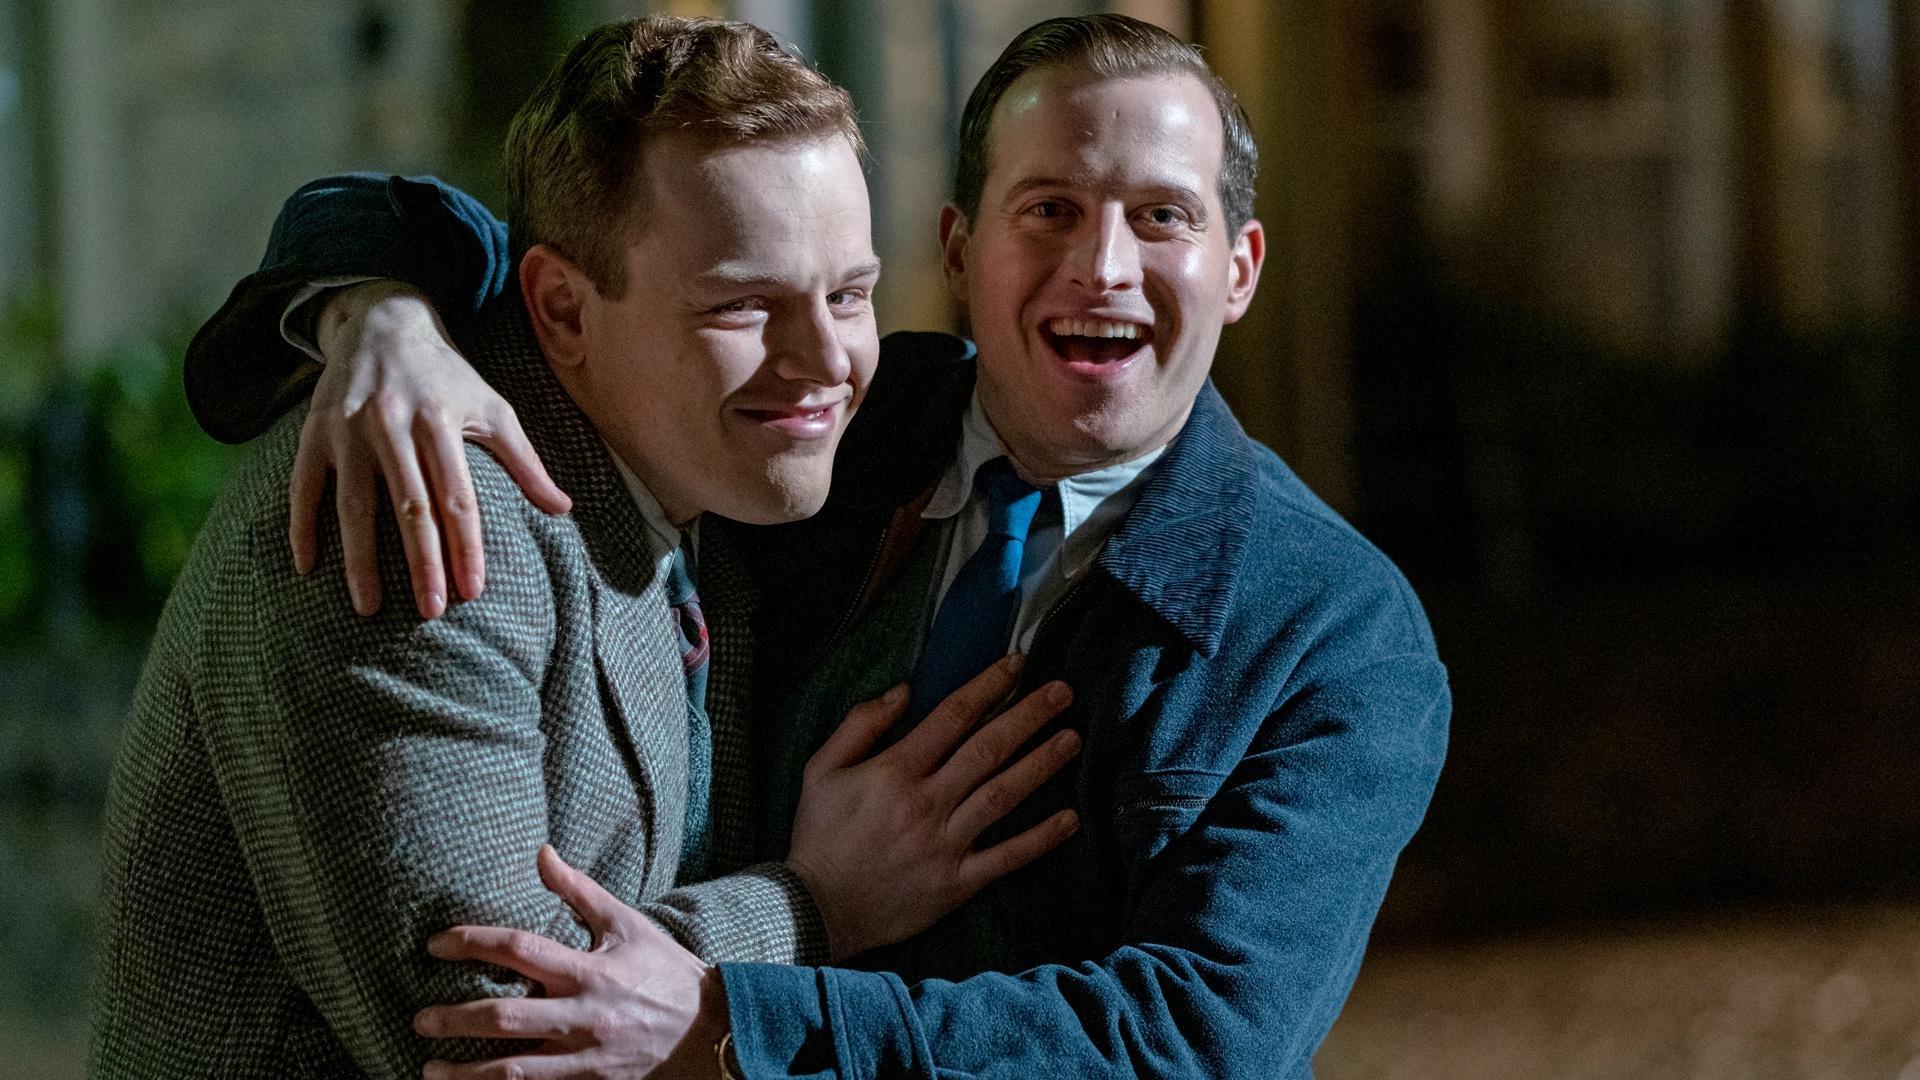 The Bromance: James & Tristan